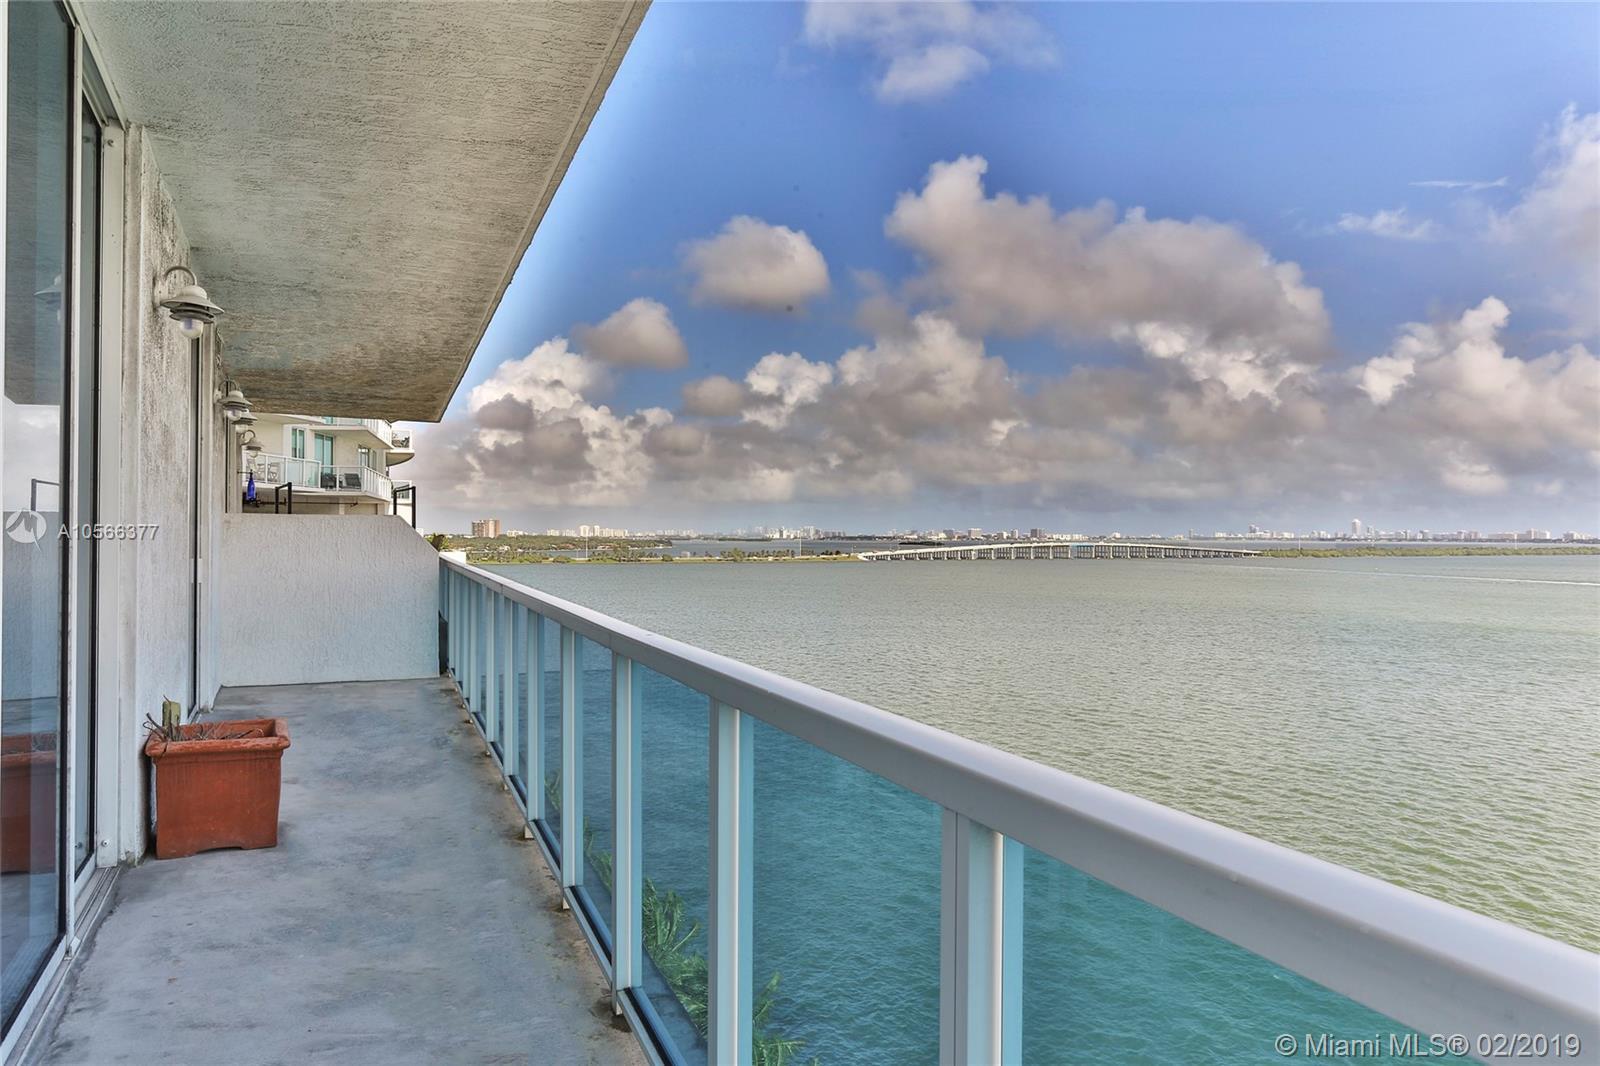 700 NE 25th St, 802 - Miami, Florida